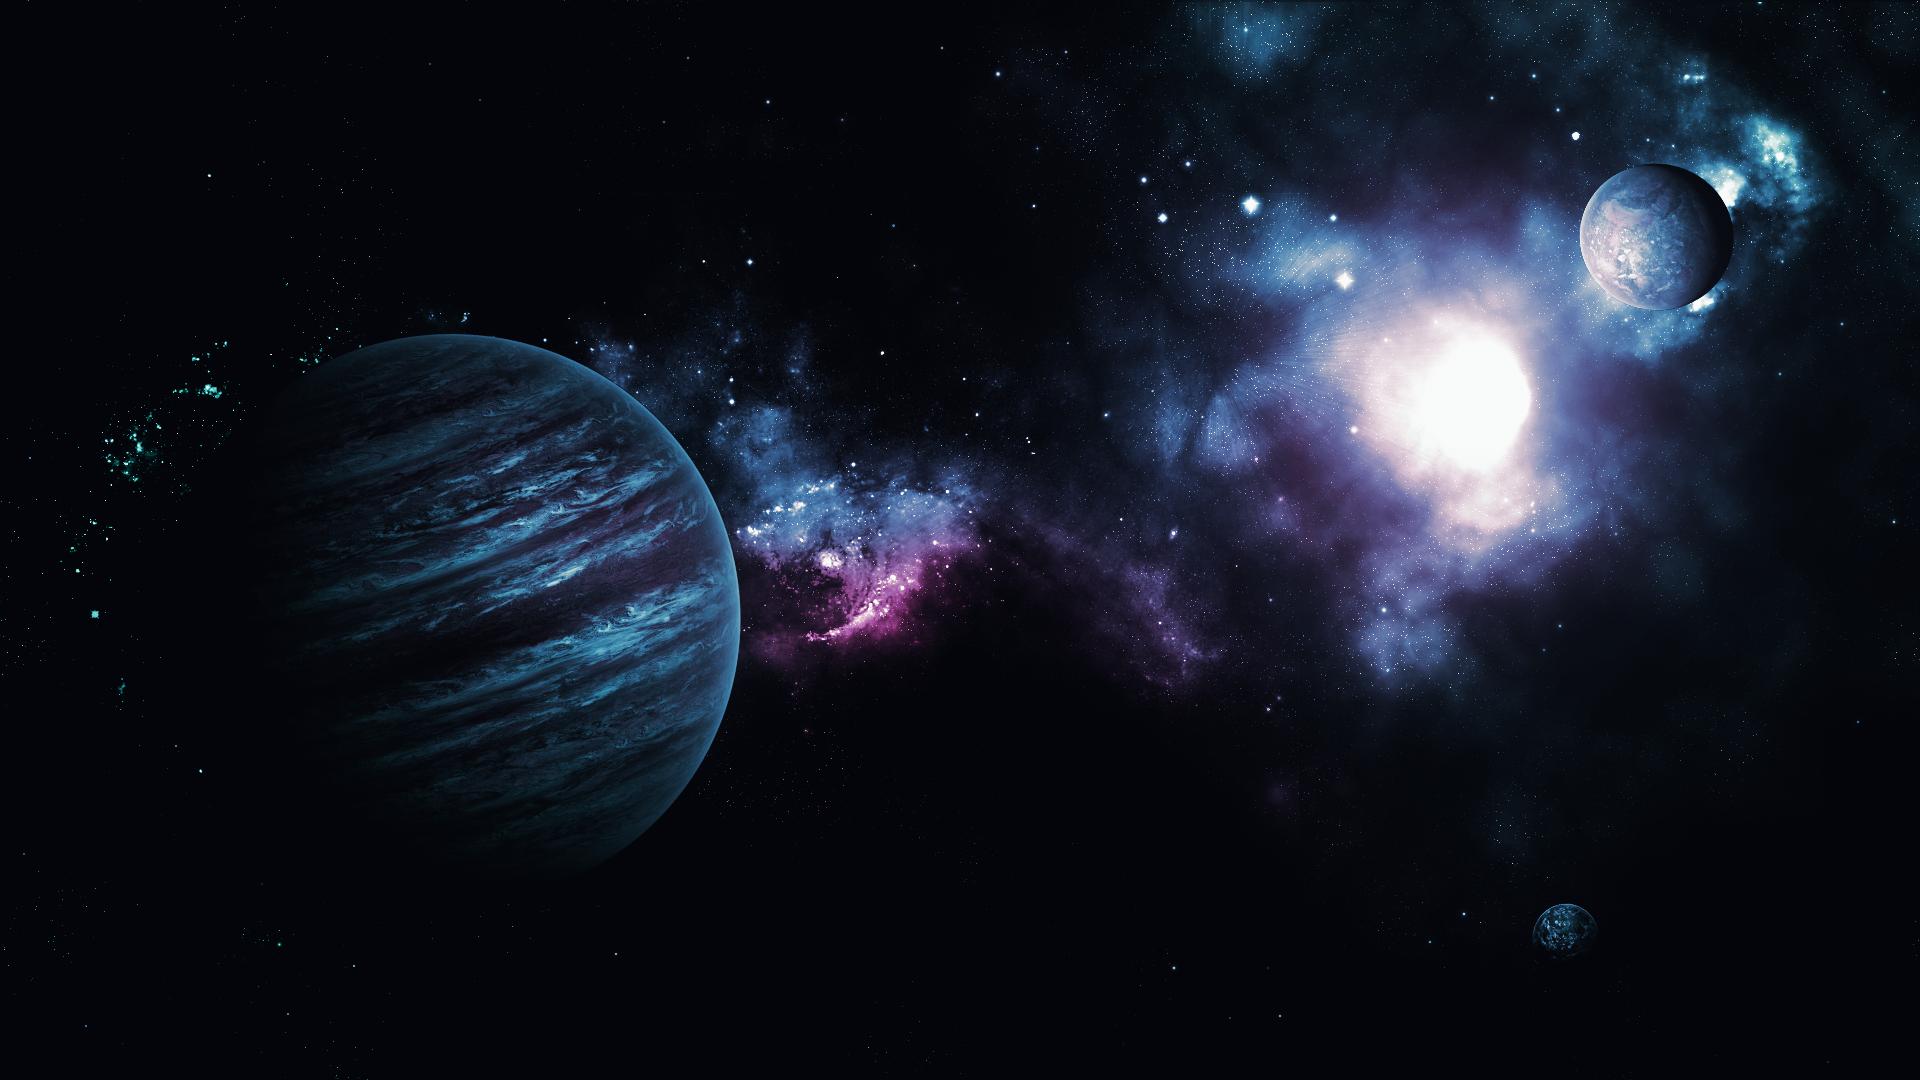 3 Planets so far (Wallpaper) by Hardii